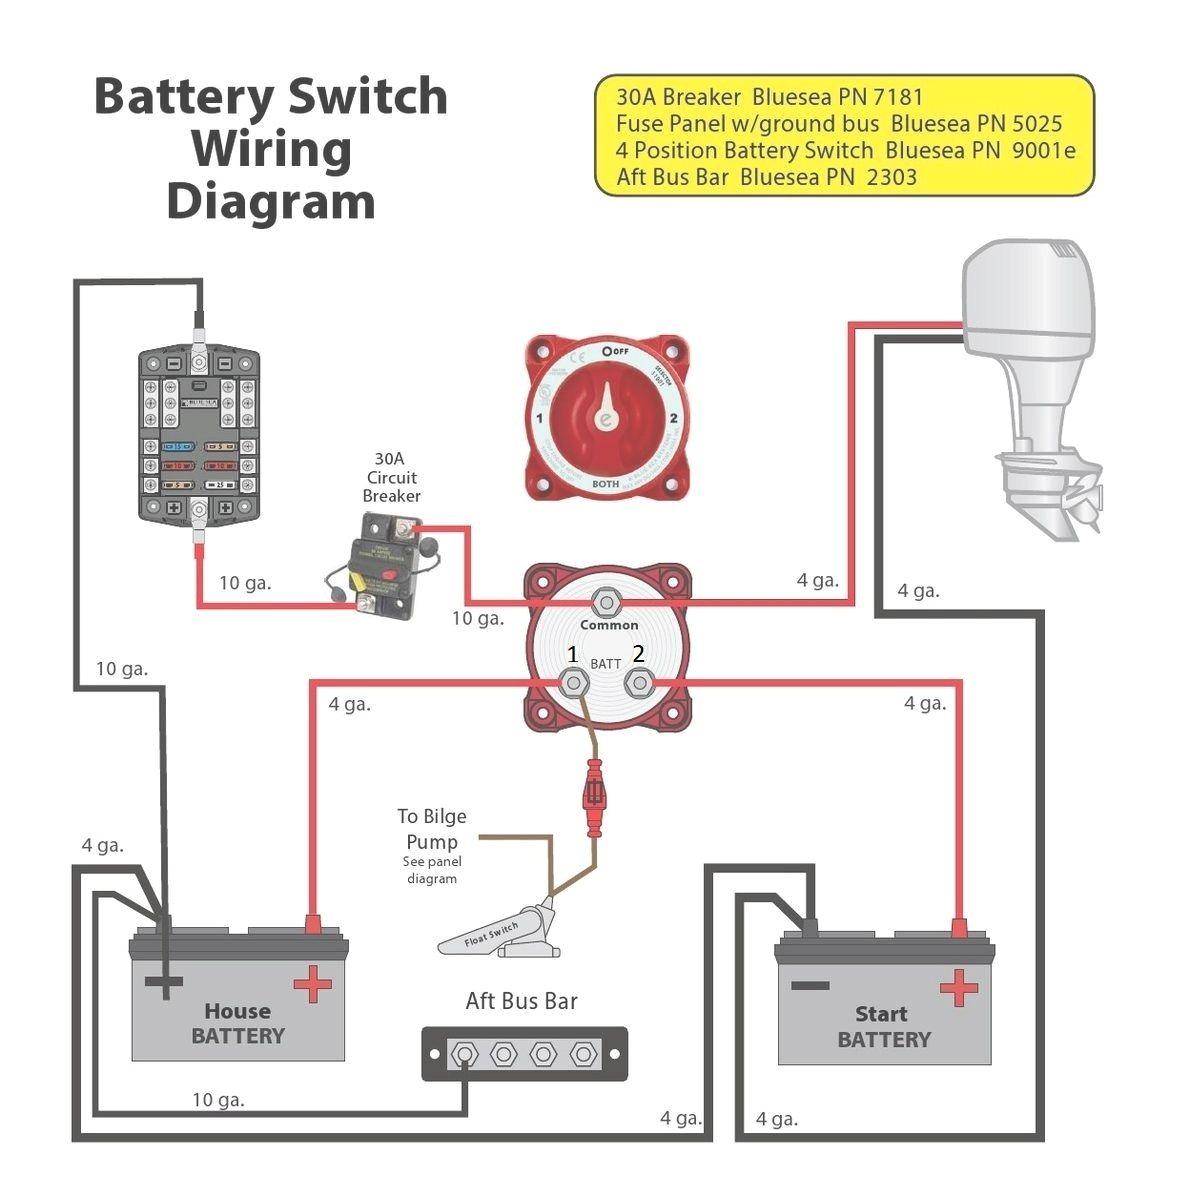 b boat wiring diagram wiring diagram files boat wiring diagram wire split b boat wiring diagram